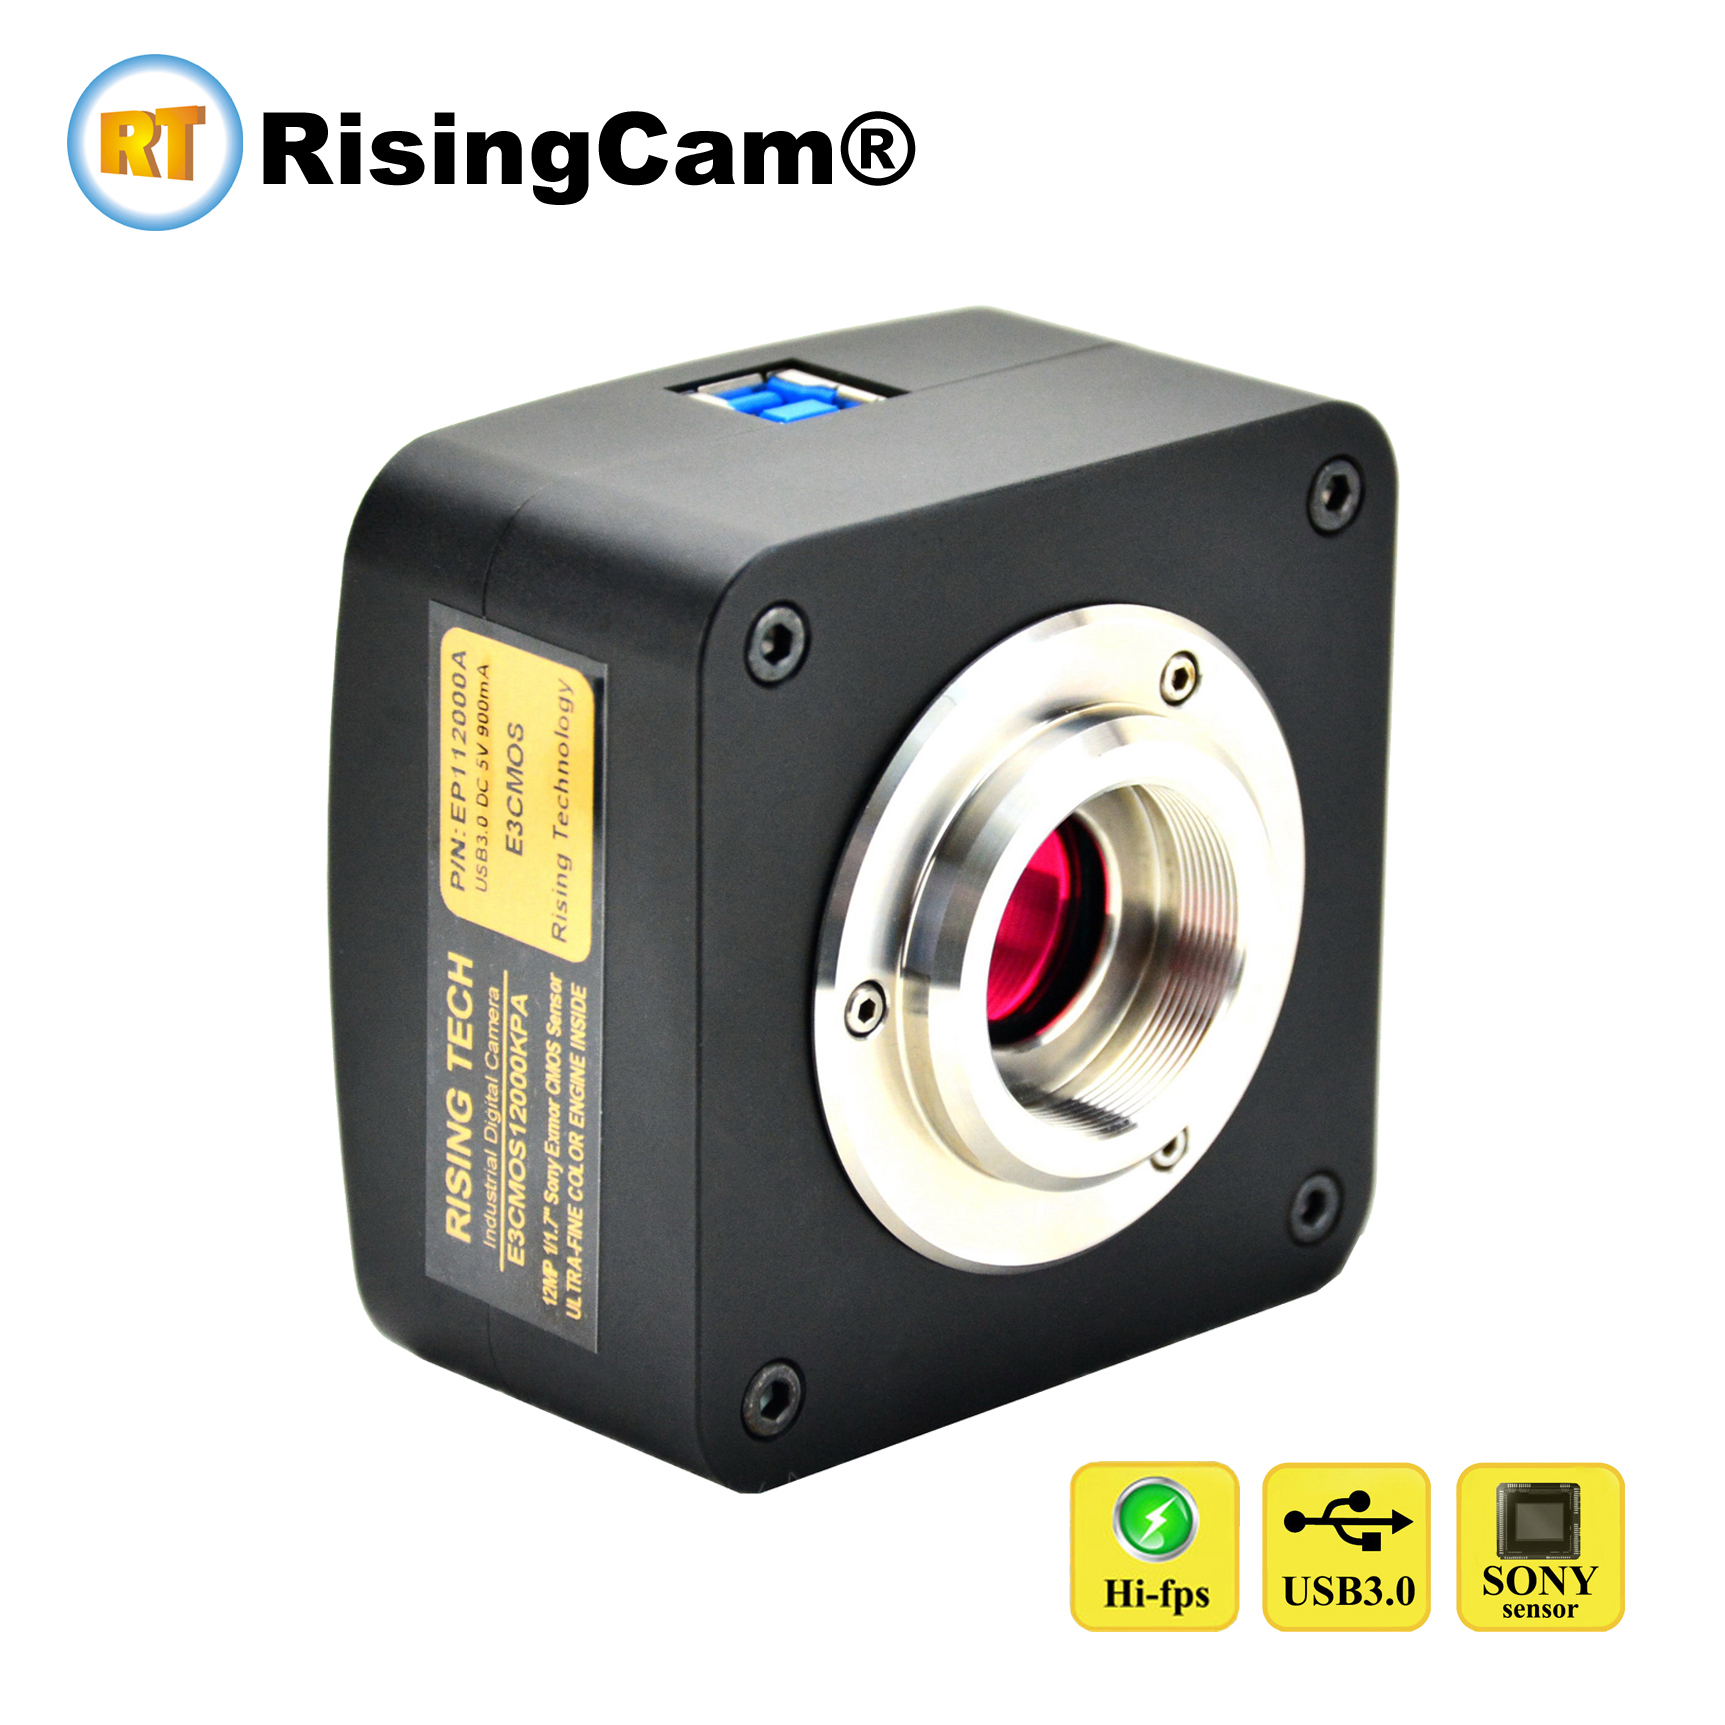 High Sensitivity 50fps 5 0MP SONY imx264 sensor USB3 0 Microscope Camera for Darkfield and fluorescent